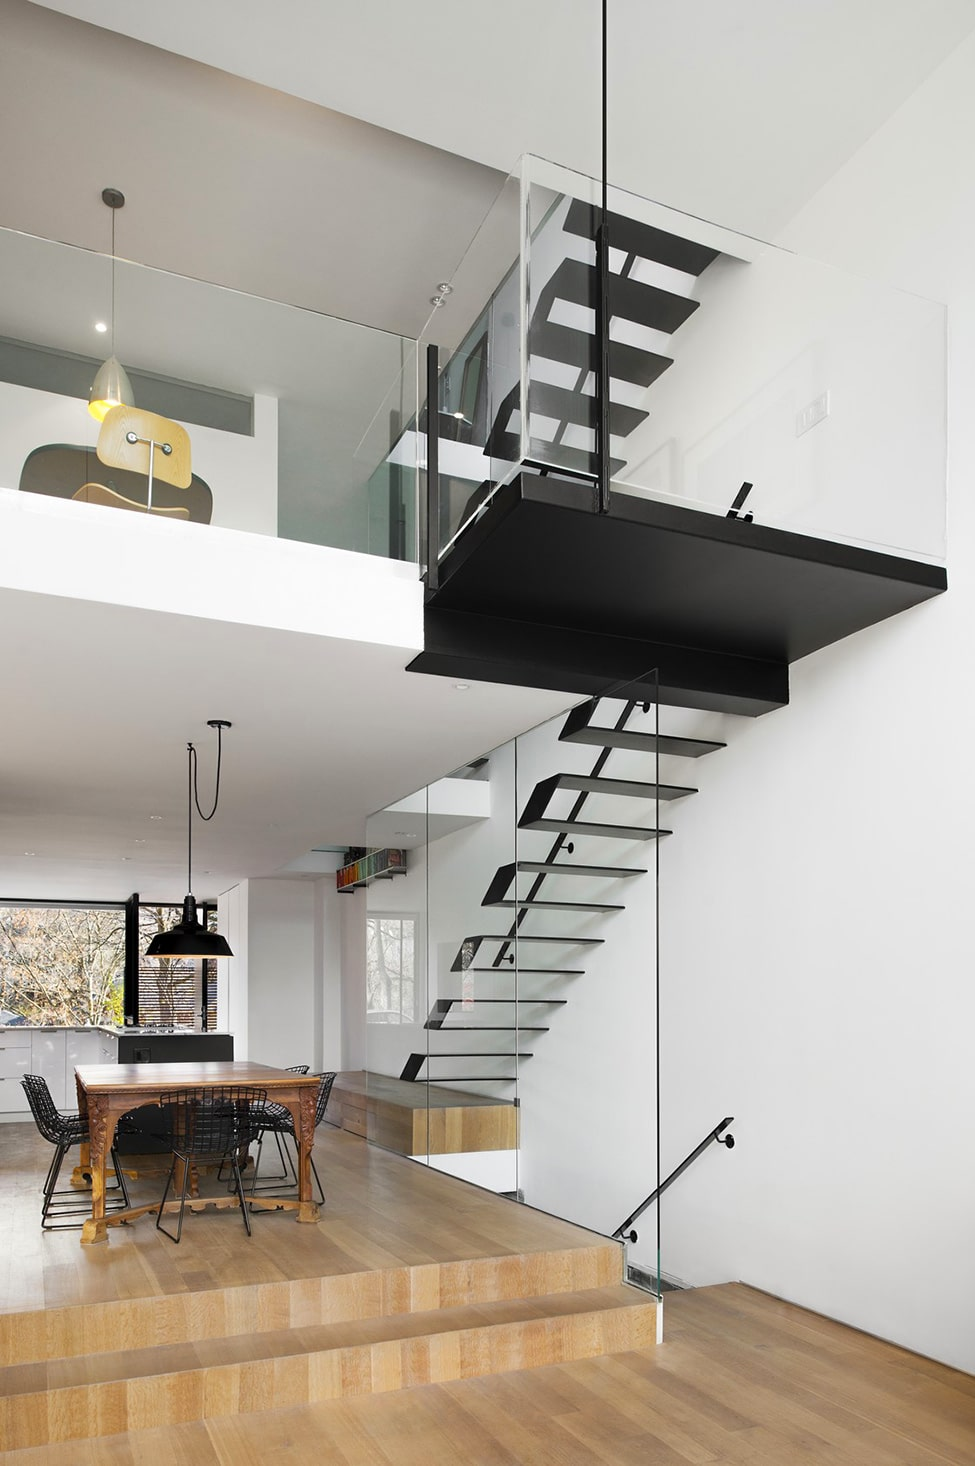 Planos de casa angosta y larga construye hogar - Escaleras modernas interiores ...